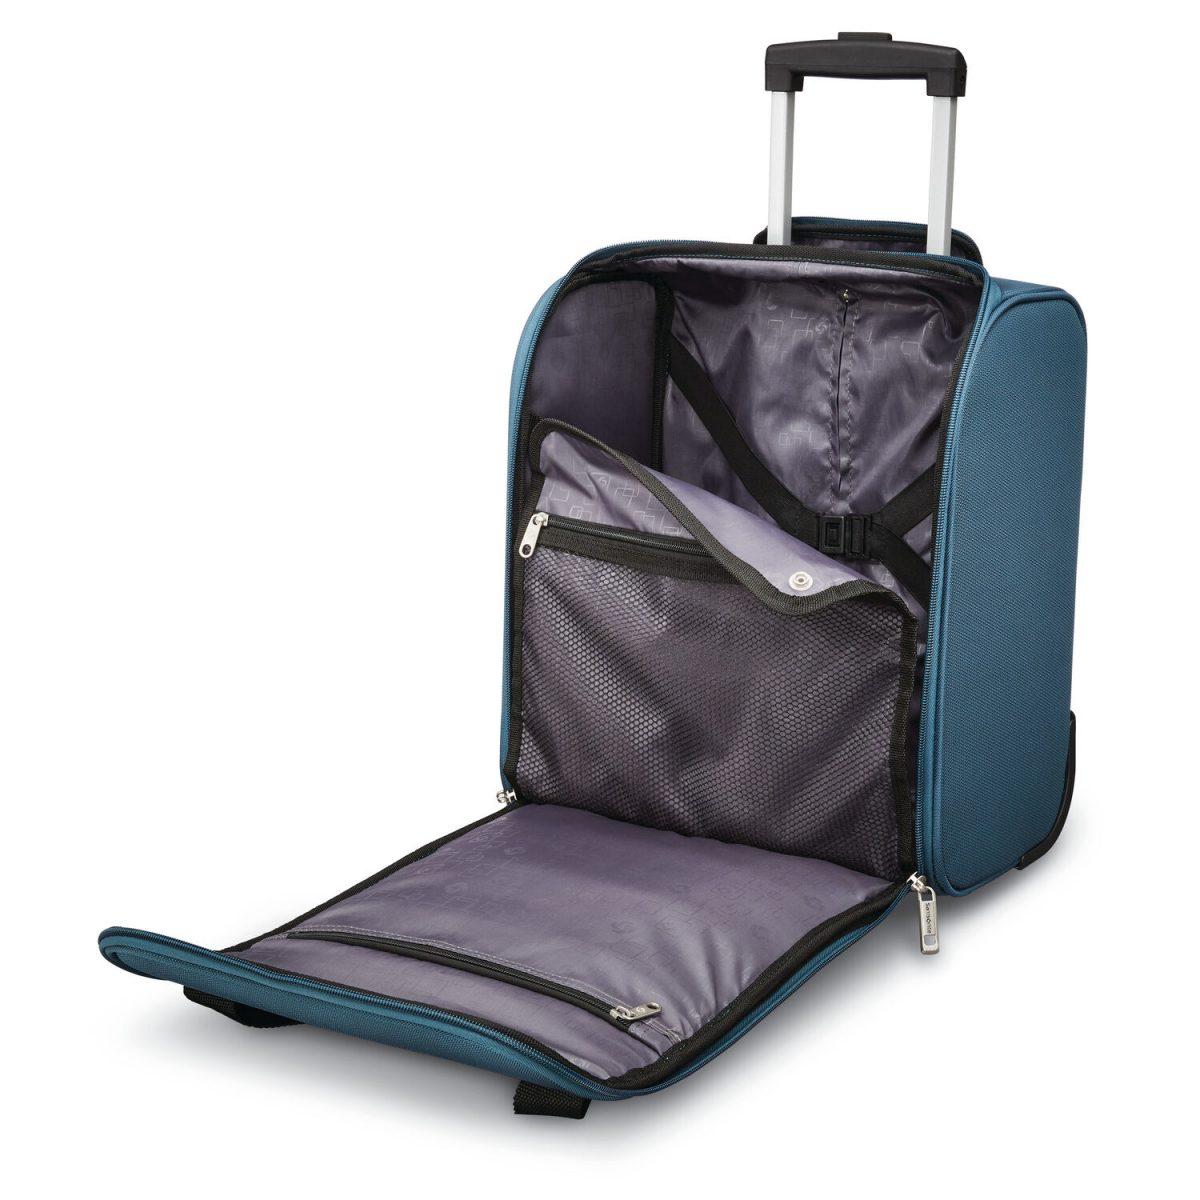 Samsonite under-seat luggage